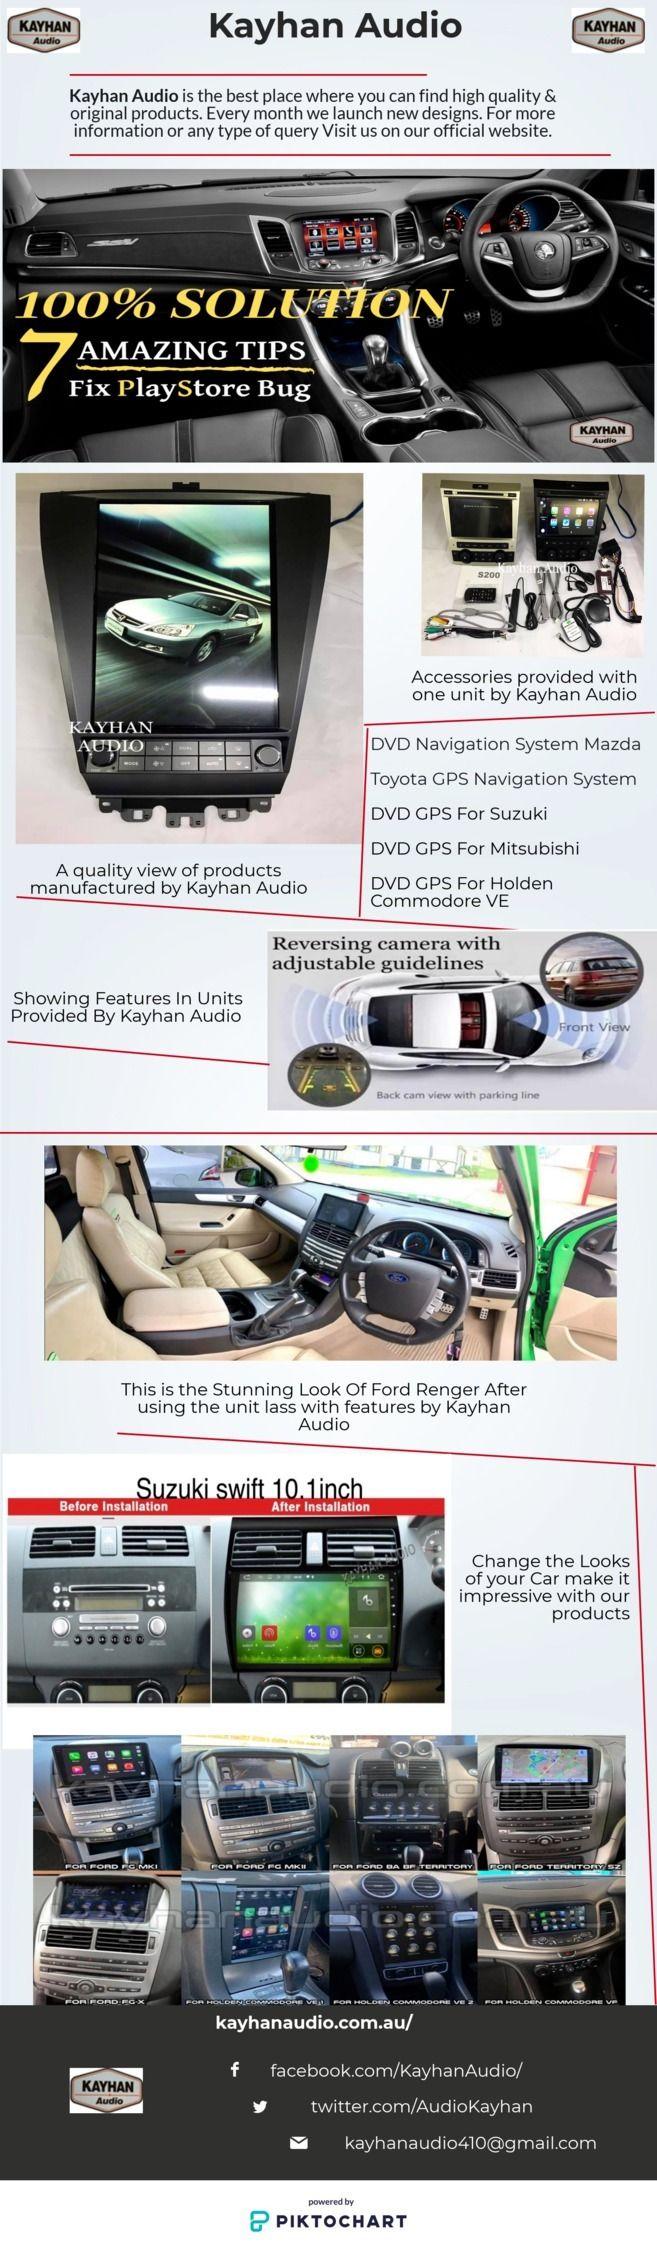 DVD Navigation System Mazda Kay - kayhanaudio   ello